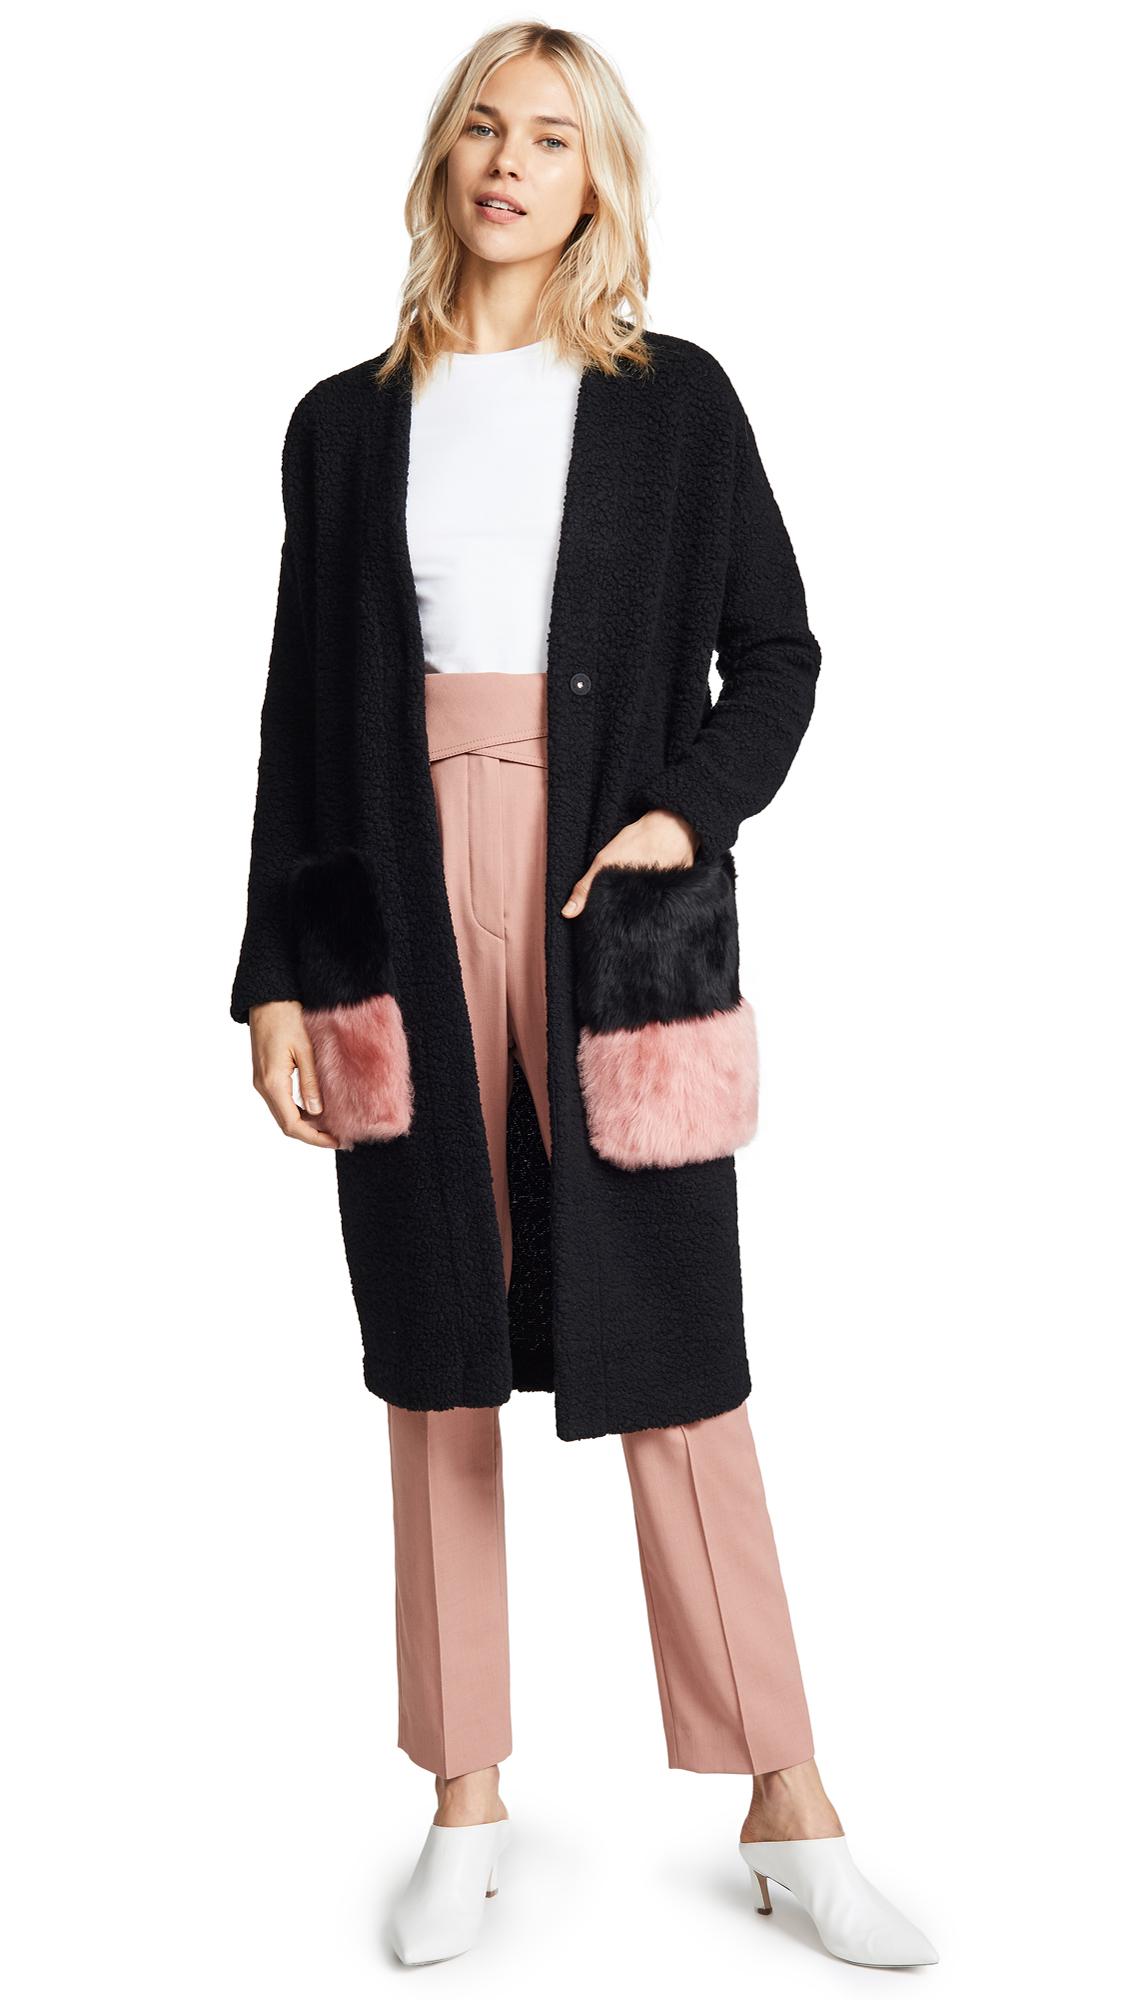 ANNE VEST Brisbane Cardigan in Black/Pink